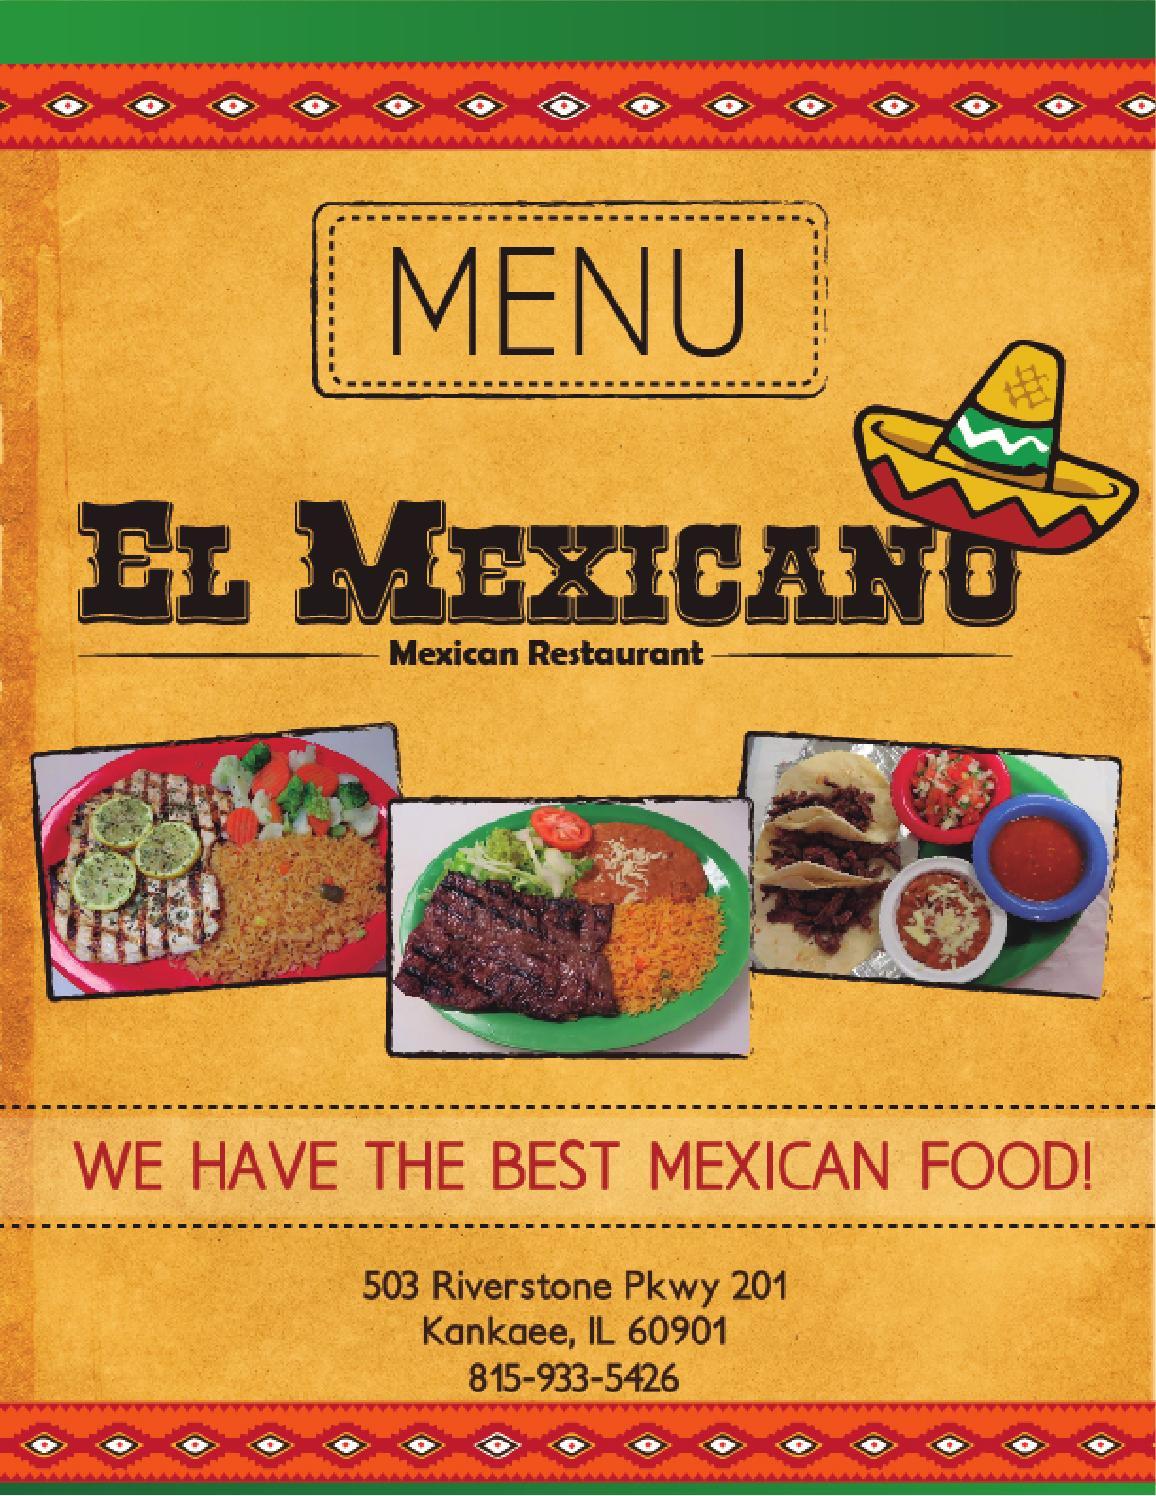 Menu Restaurant El Mexicano By Tonyredmor Issuu